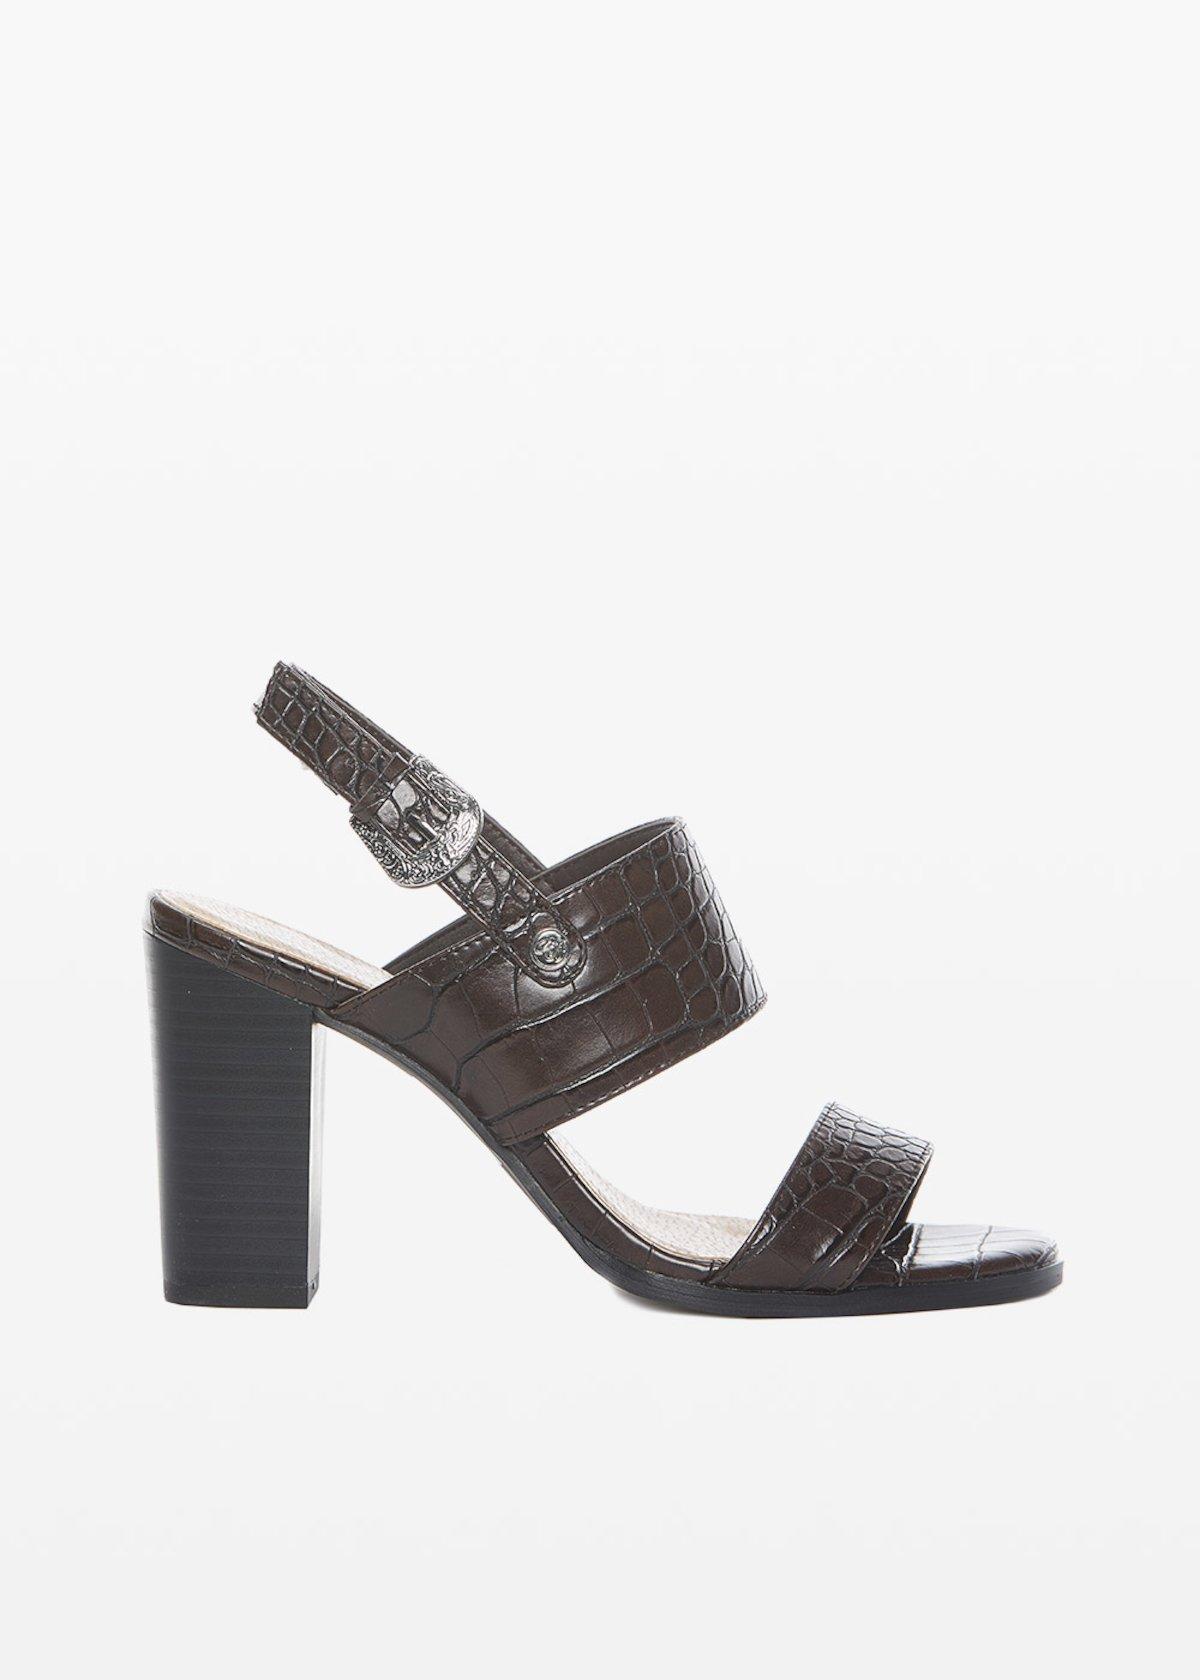 Sael sandals crocodile effect - Crosta - Woman